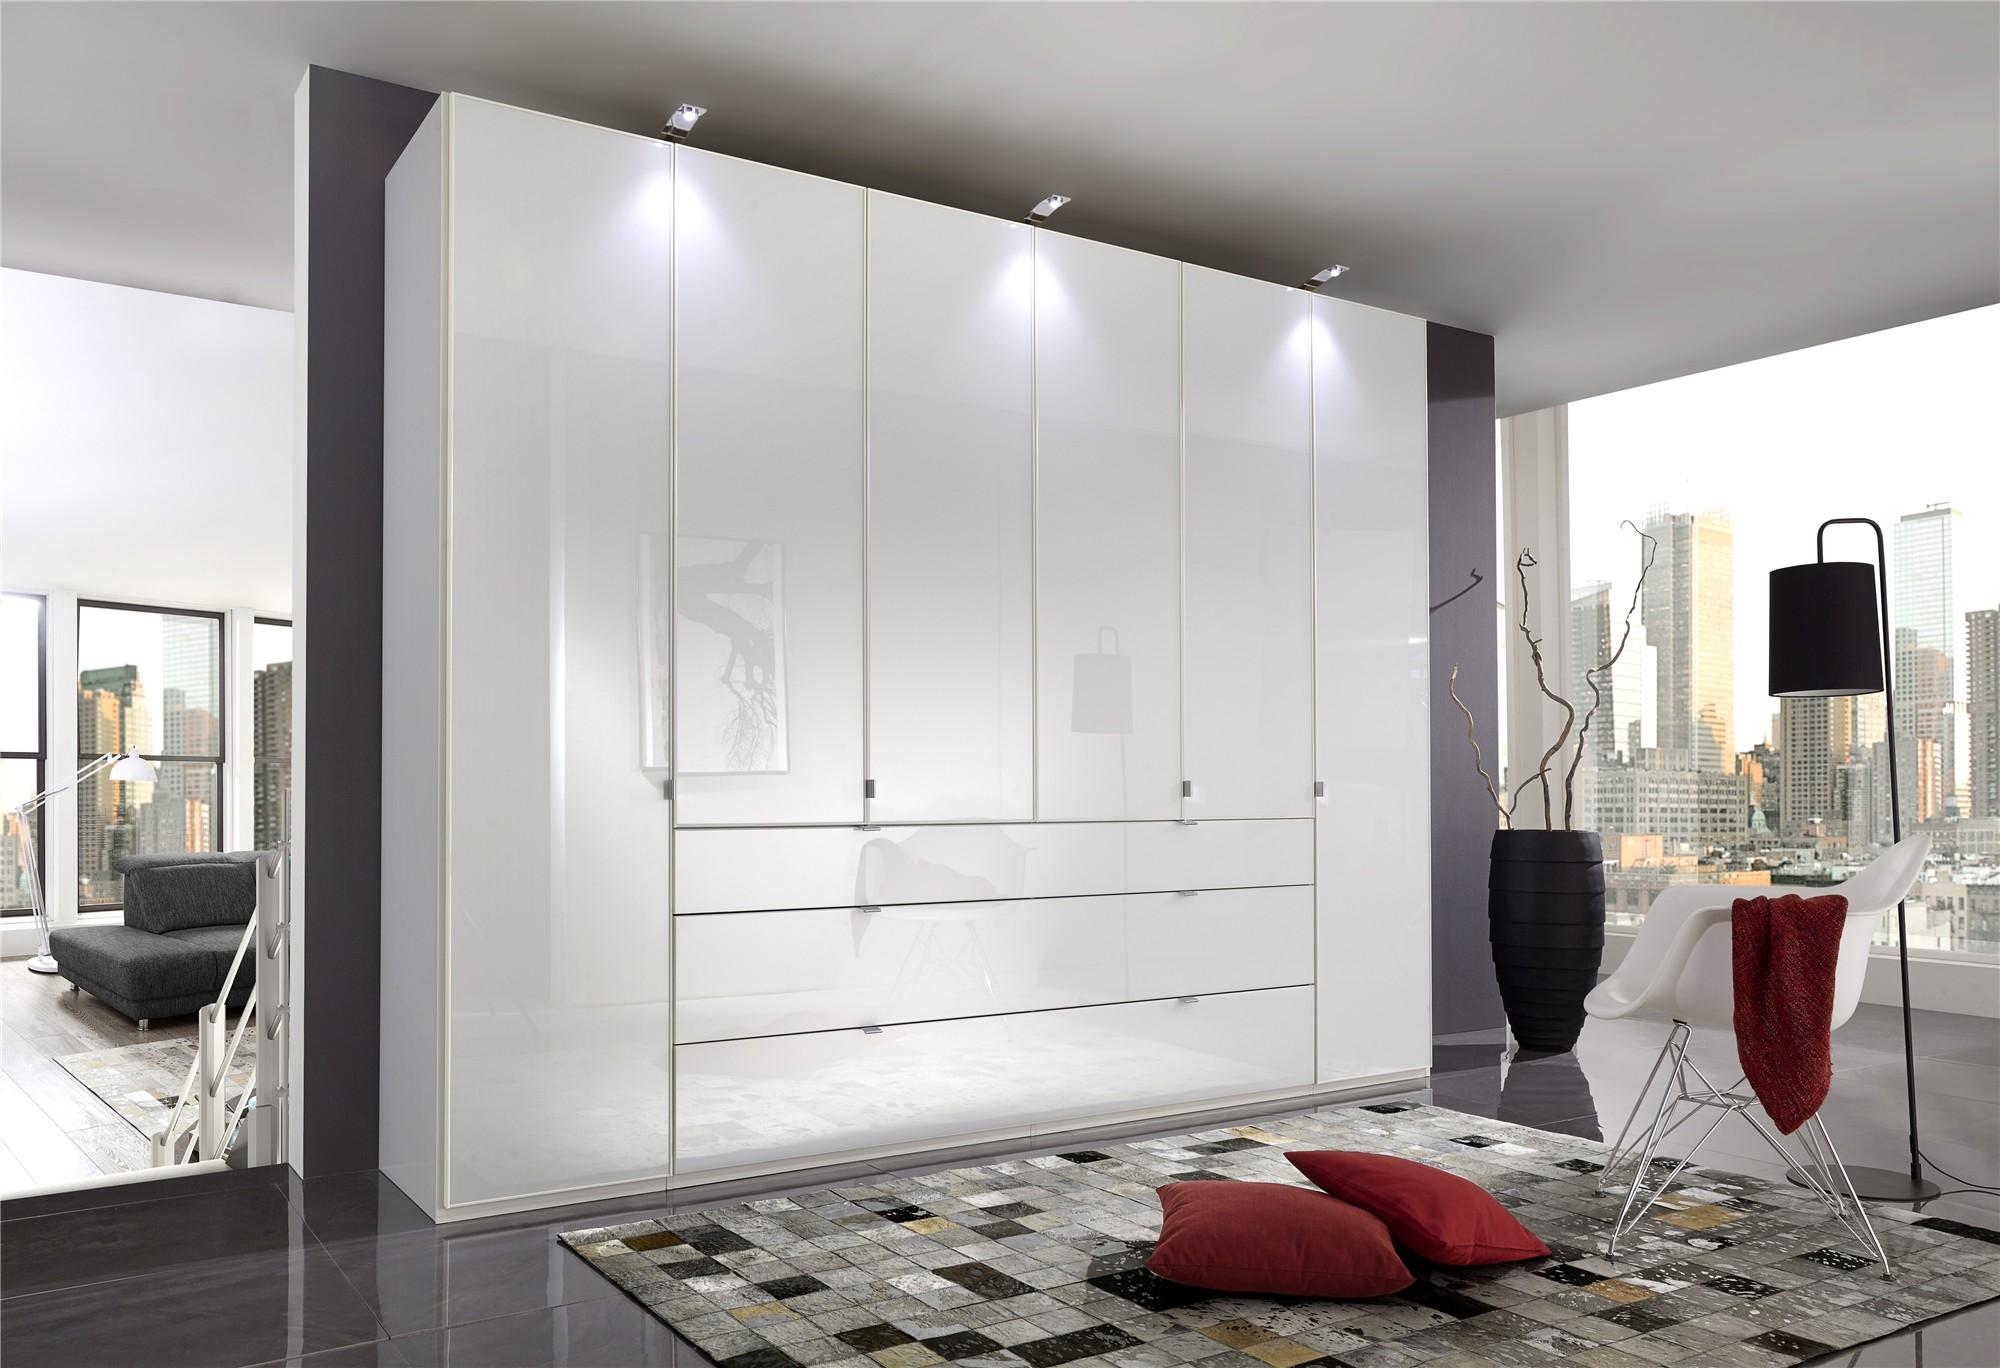 2 Door Wardrobe & 4+2 Drawer Chest in Black & Walnut Bedroom Furniture Set  6 Draw